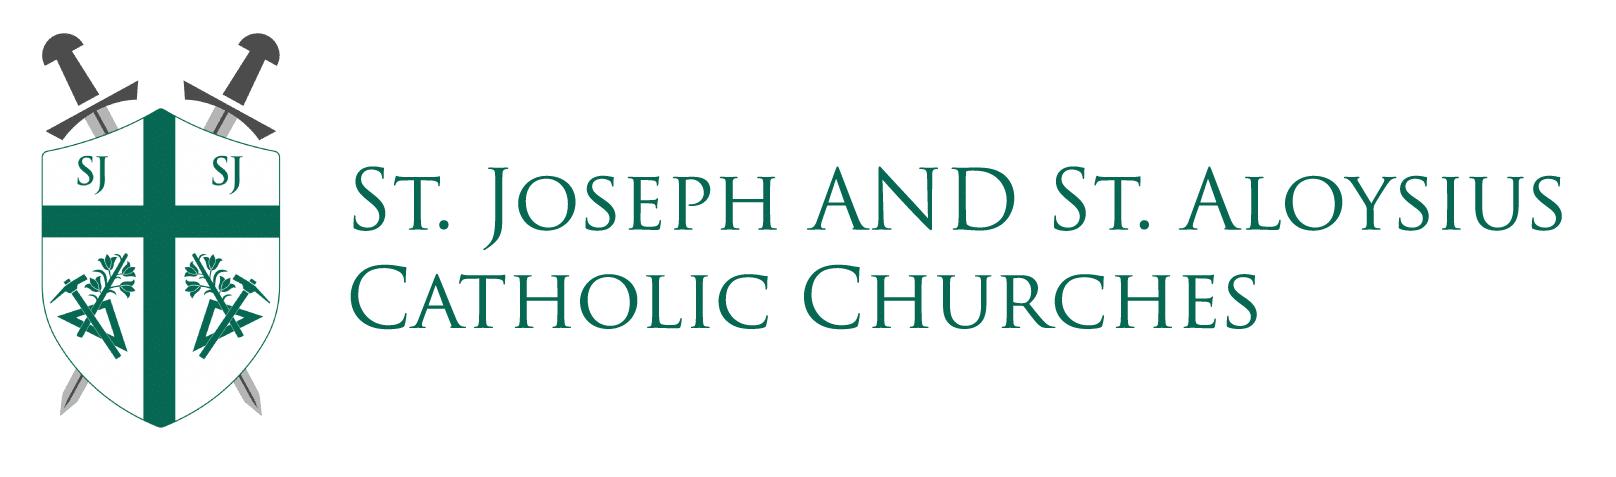 Edina St Joseph St Aloysius Temporary Logo